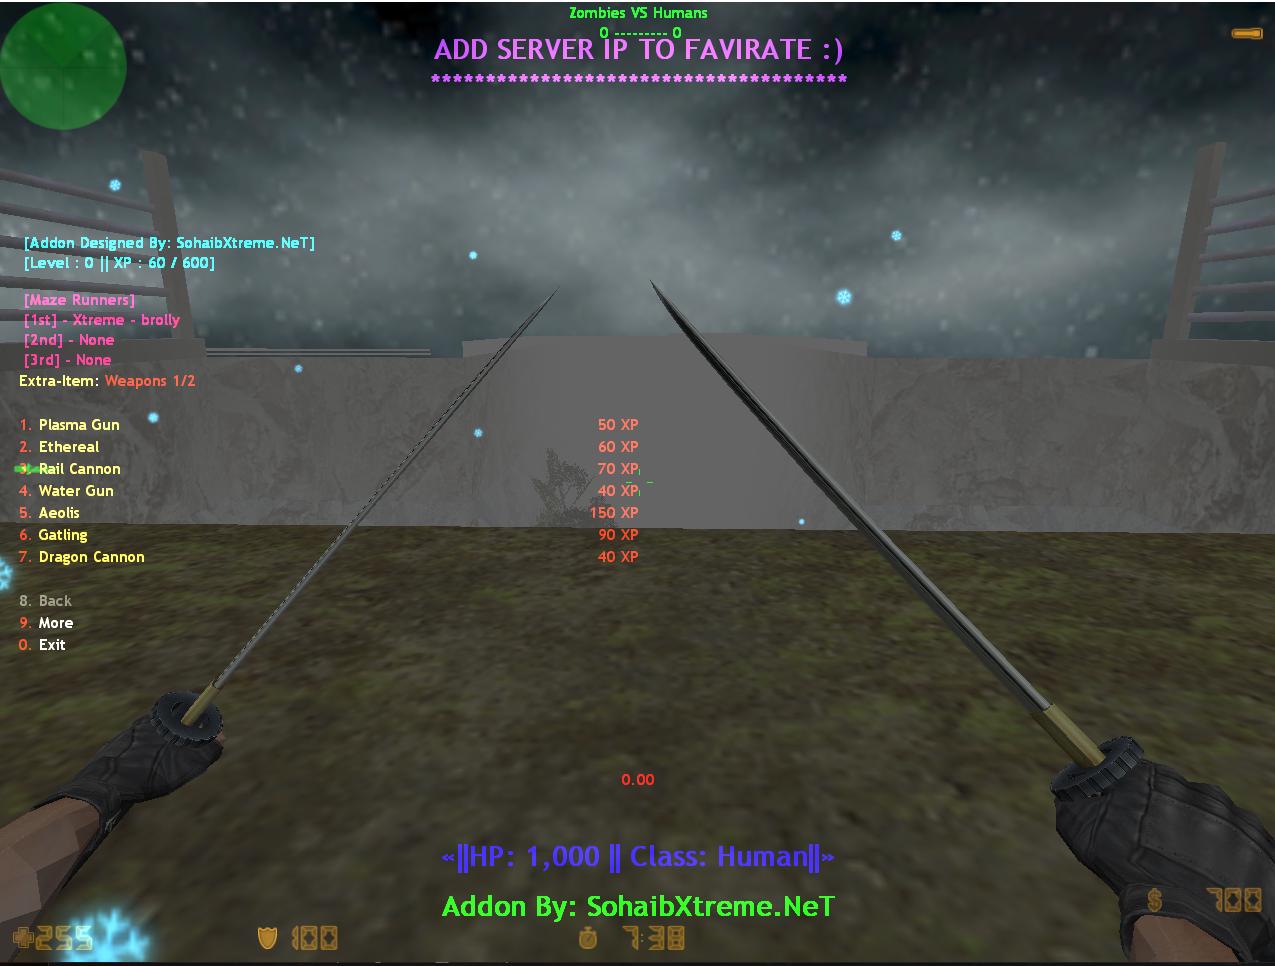 Counter-Strike 1.6 ZombieXtreme Escape v2.5 Addon/Mod Download [ 2k21 ]